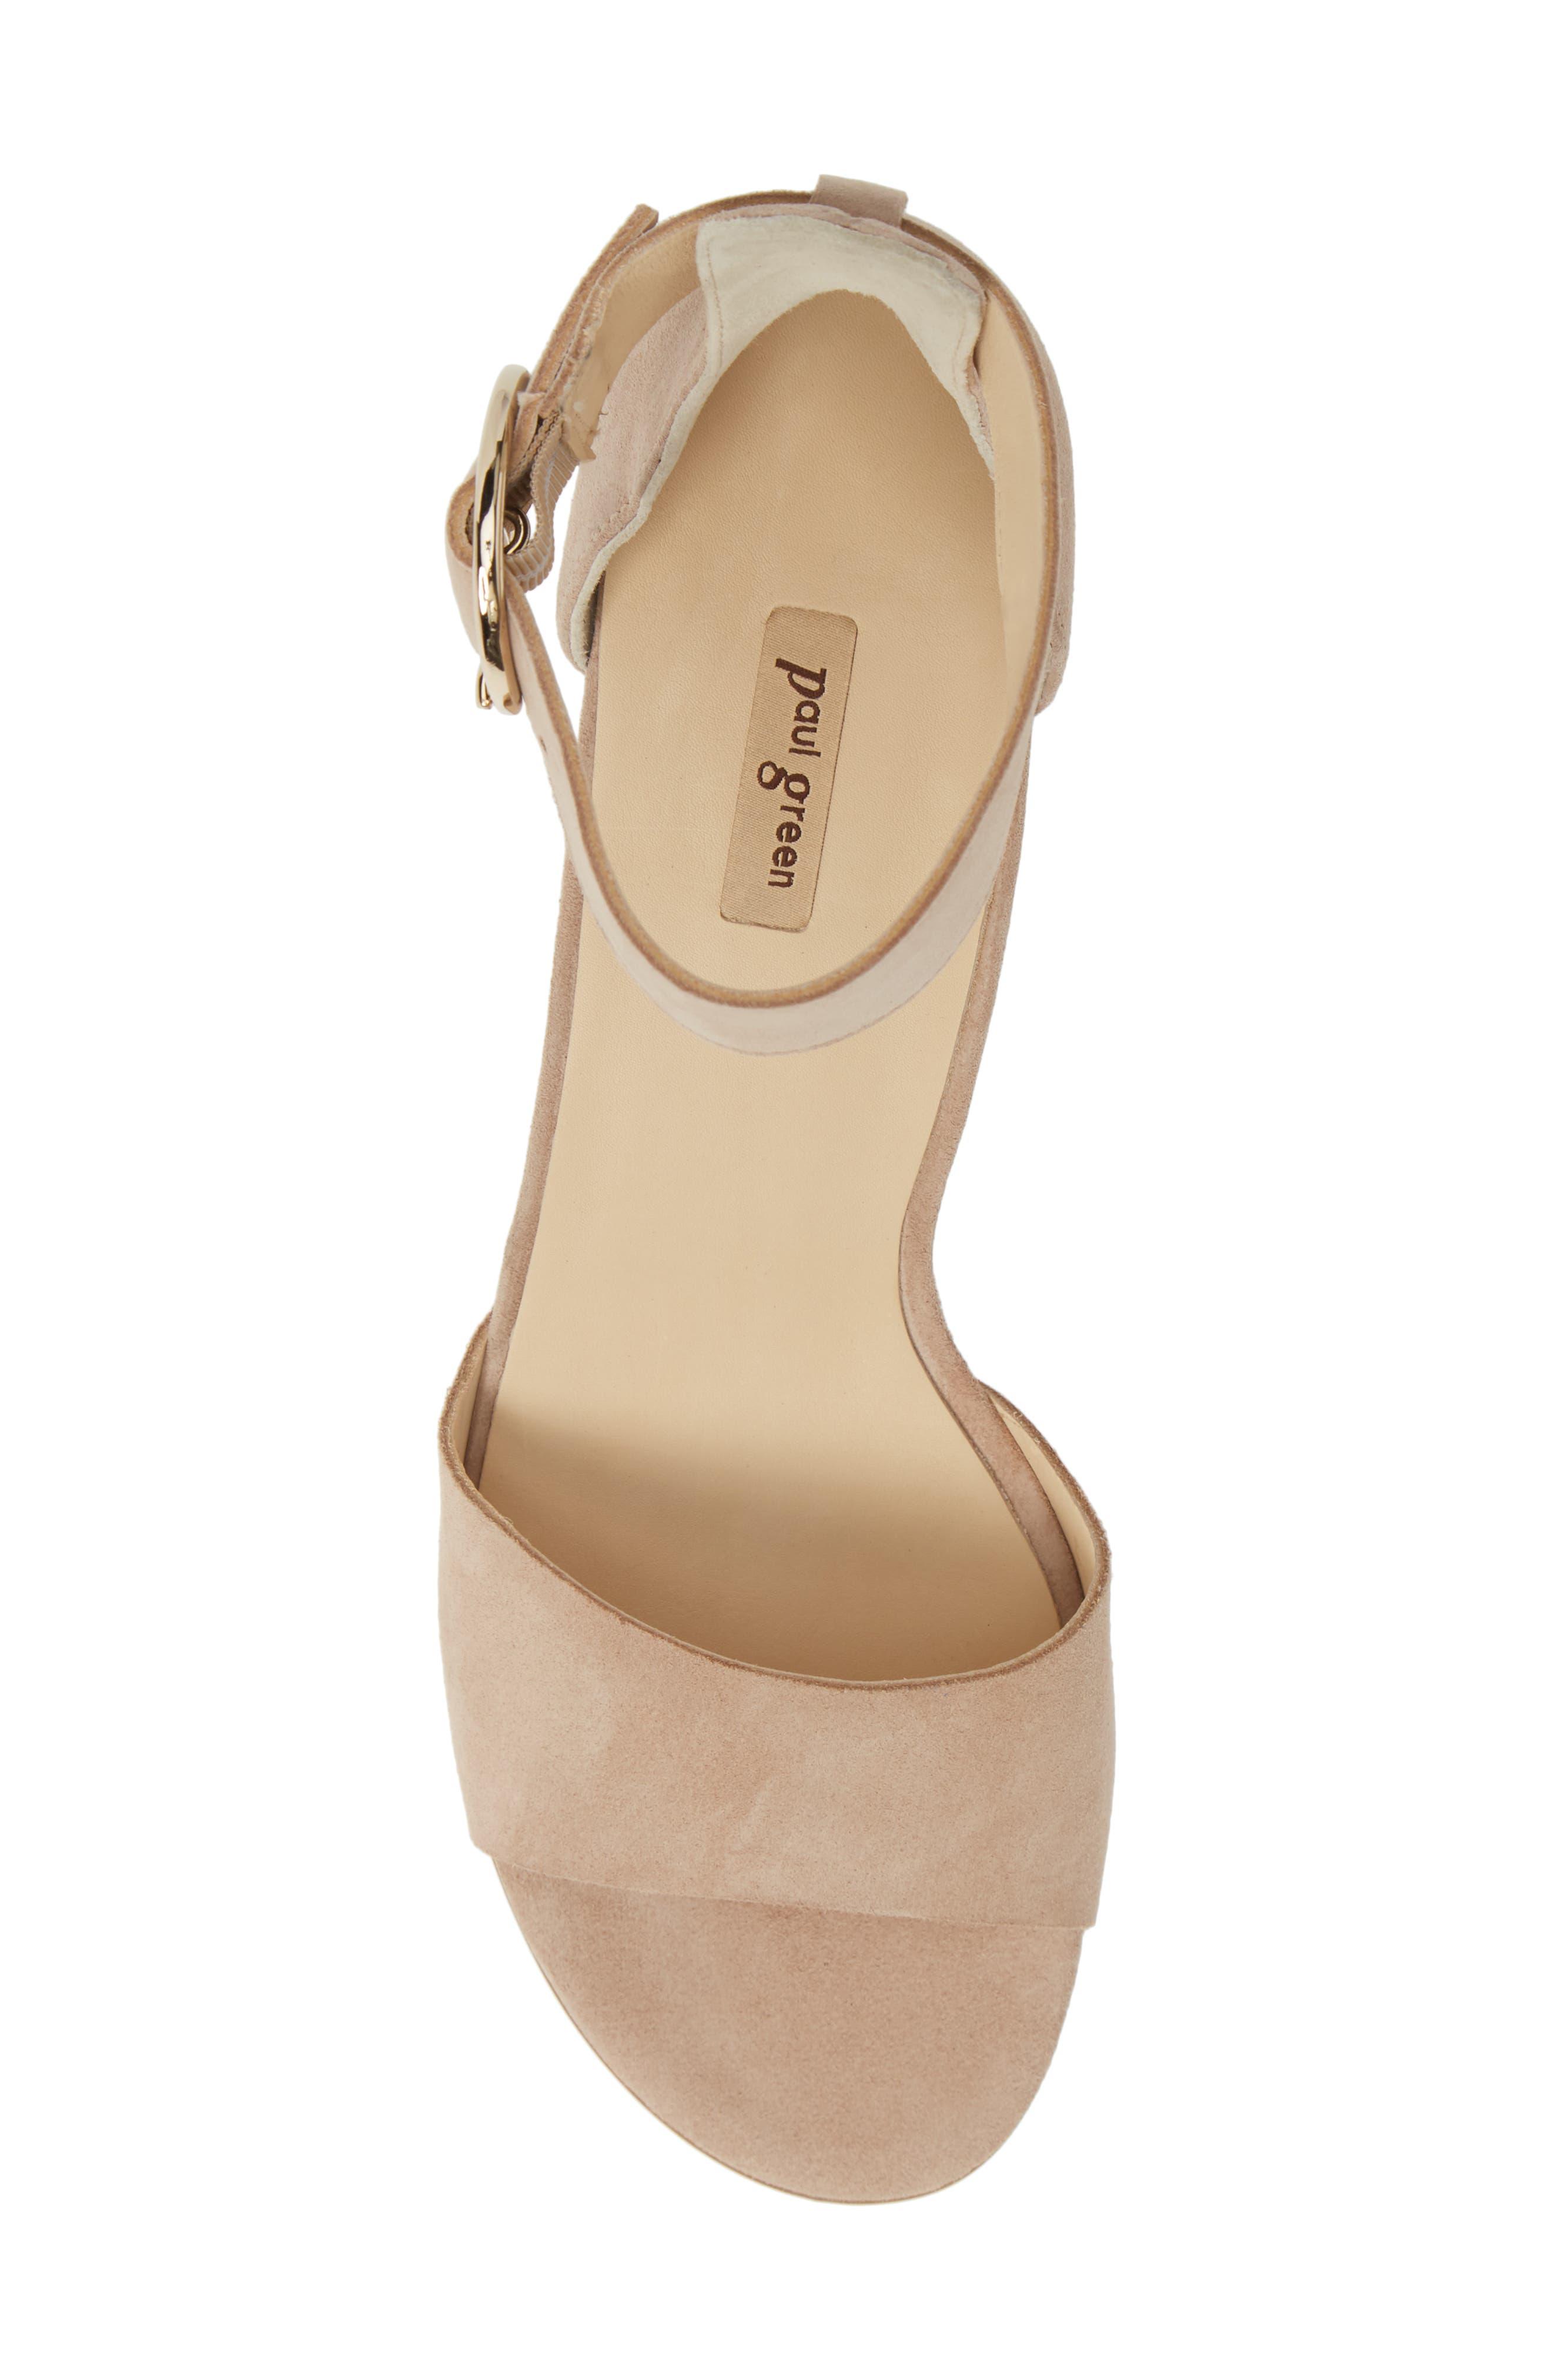 PAUL GREEN, Velma Ankle Strap Sandal, Alternate thumbnail 5, color, SAHARA SUEDE